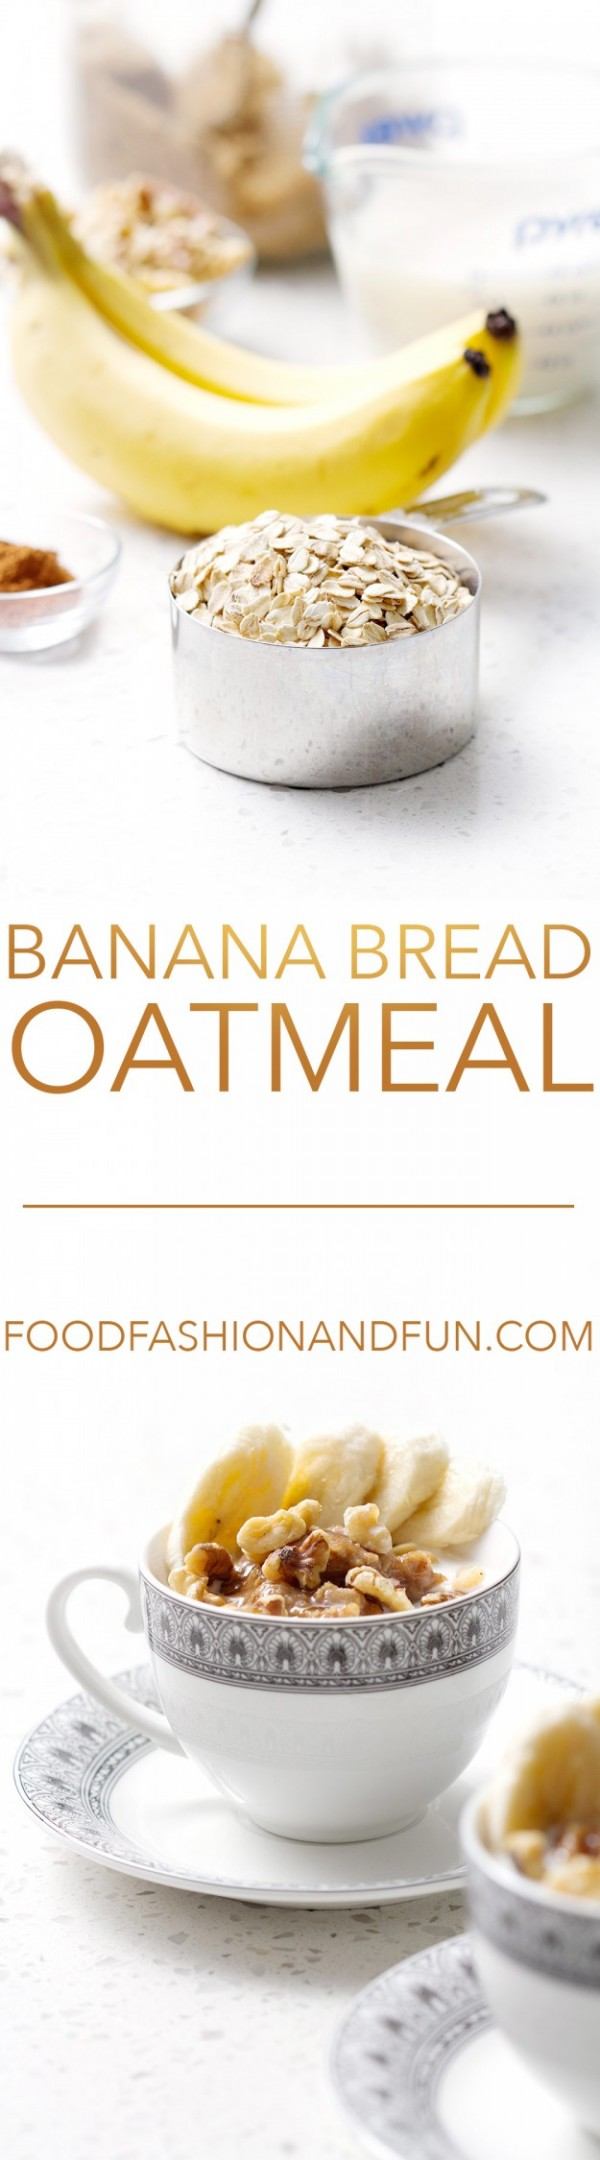 Banana Bread Oatmeal   Food Fashion and Fun